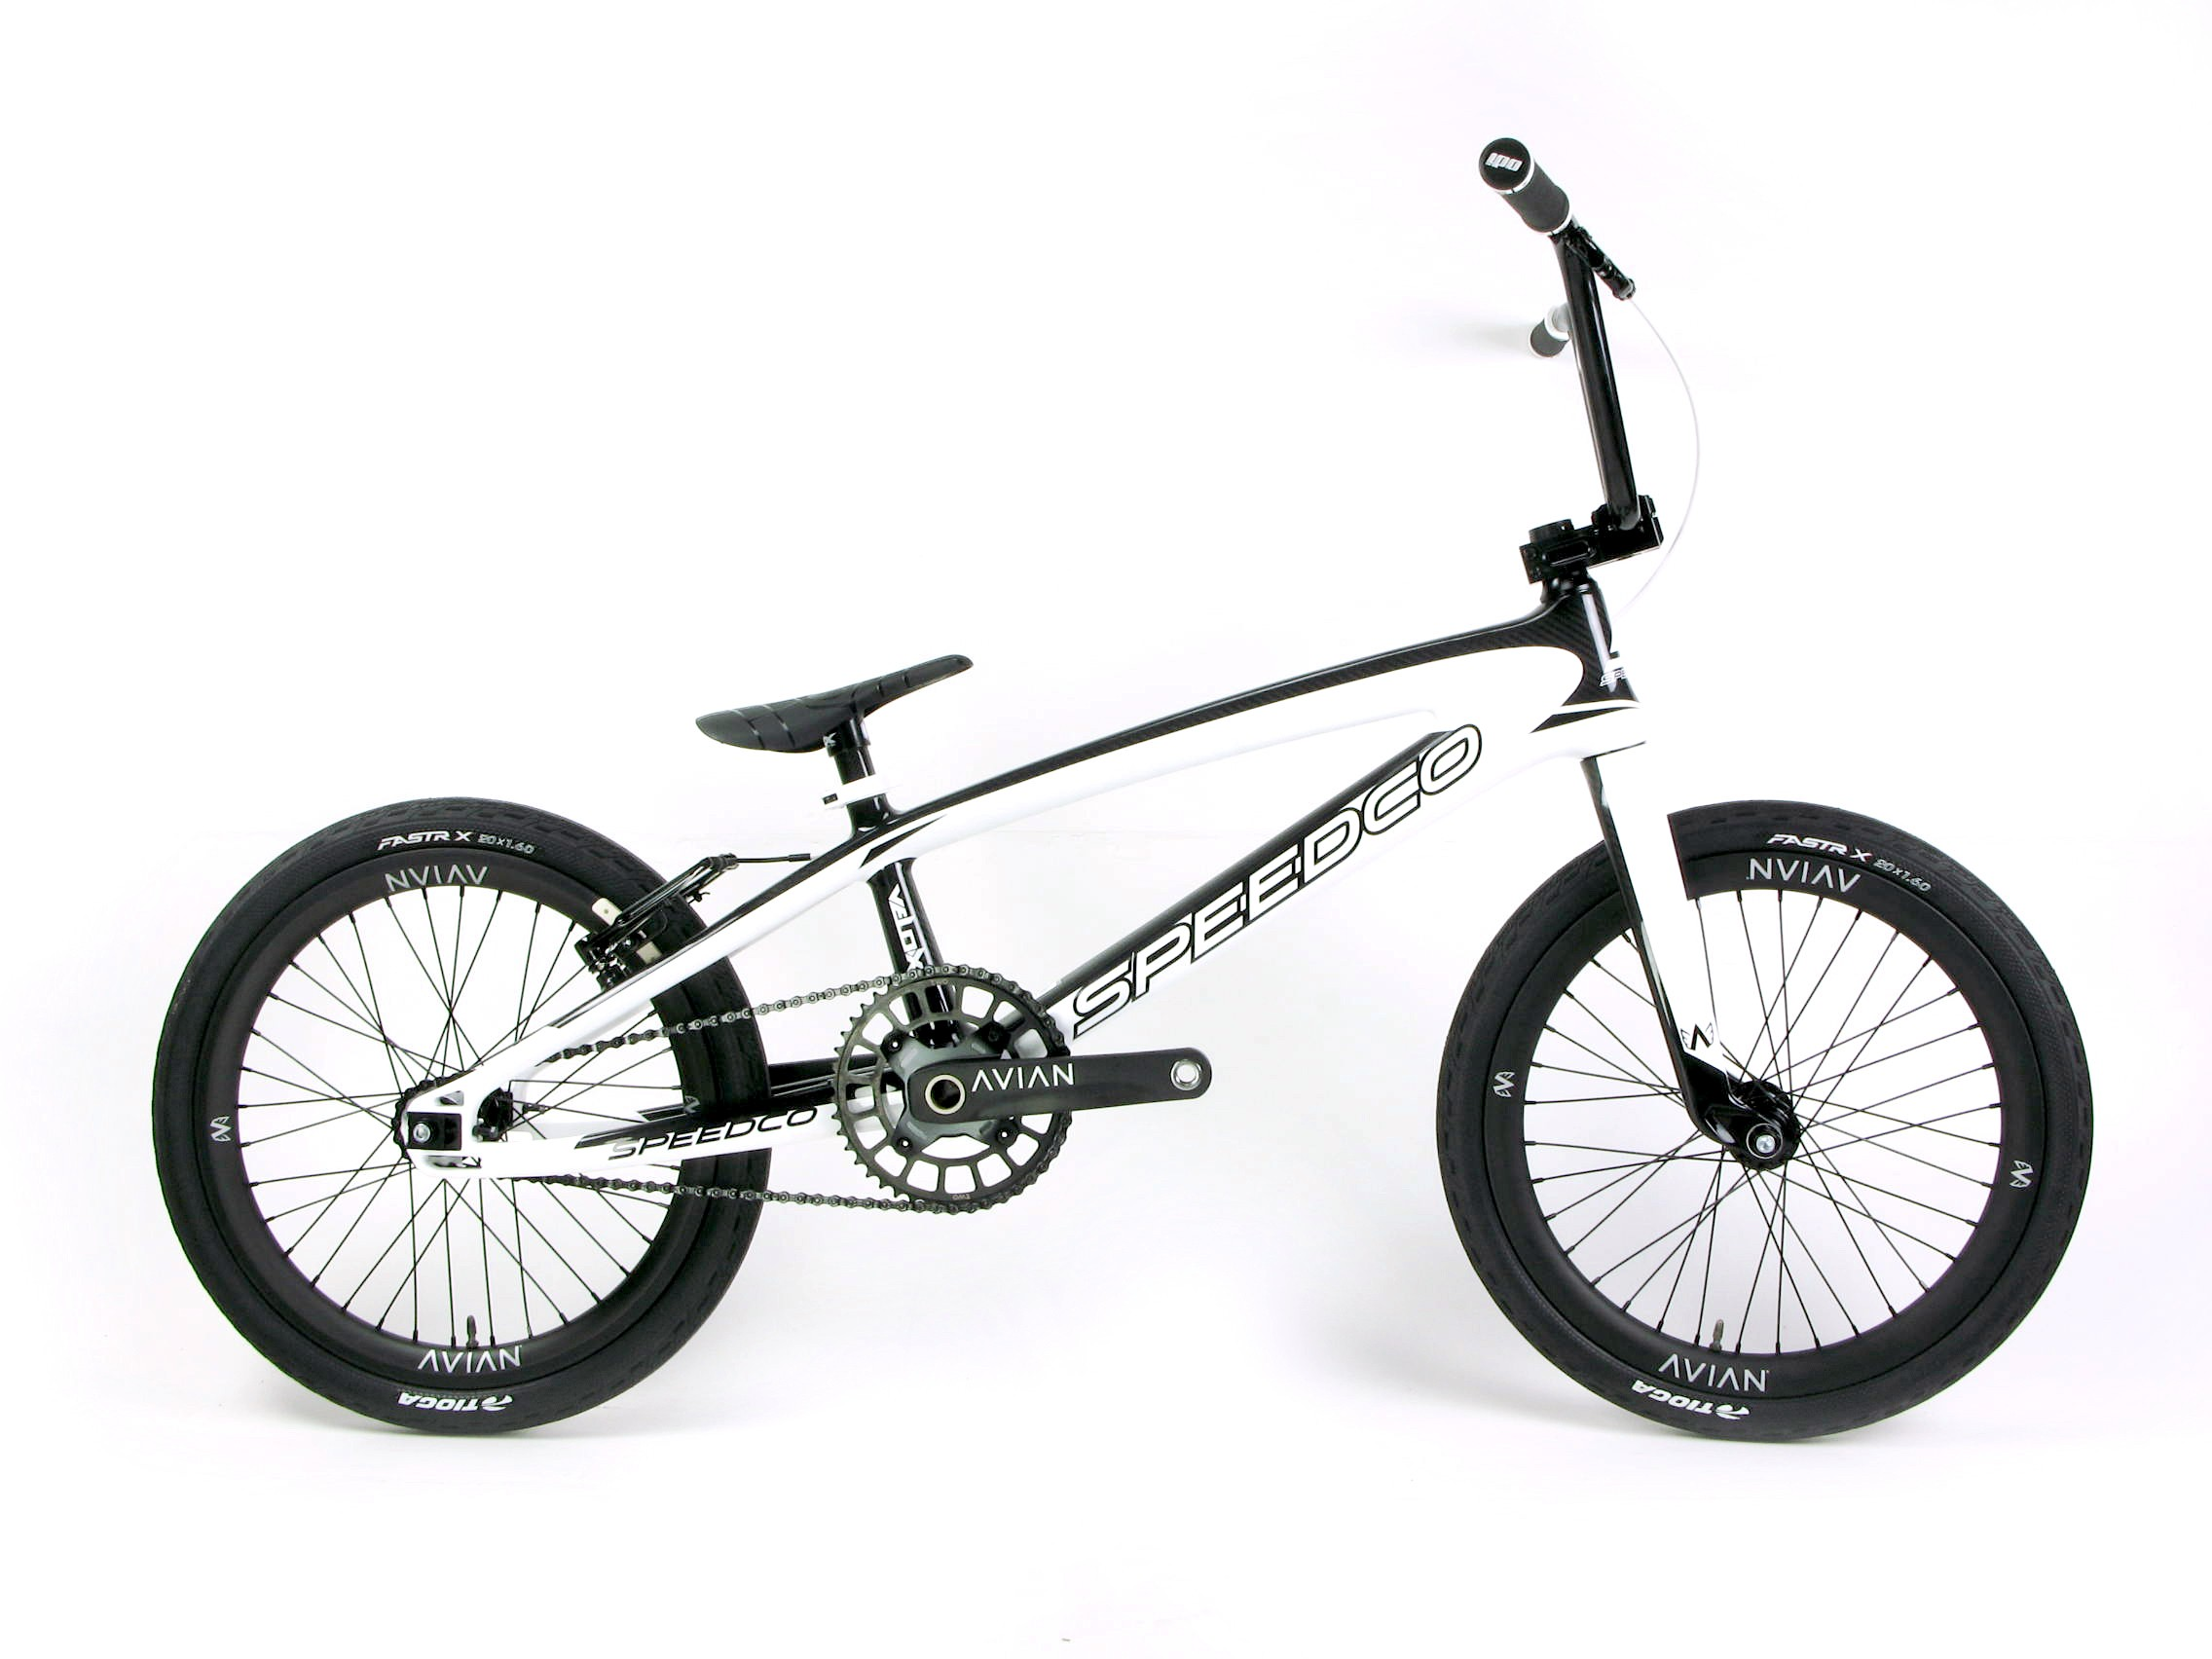 Speedco Velox Custom Carbon Bike Pro XXL - BMX24SEVEN